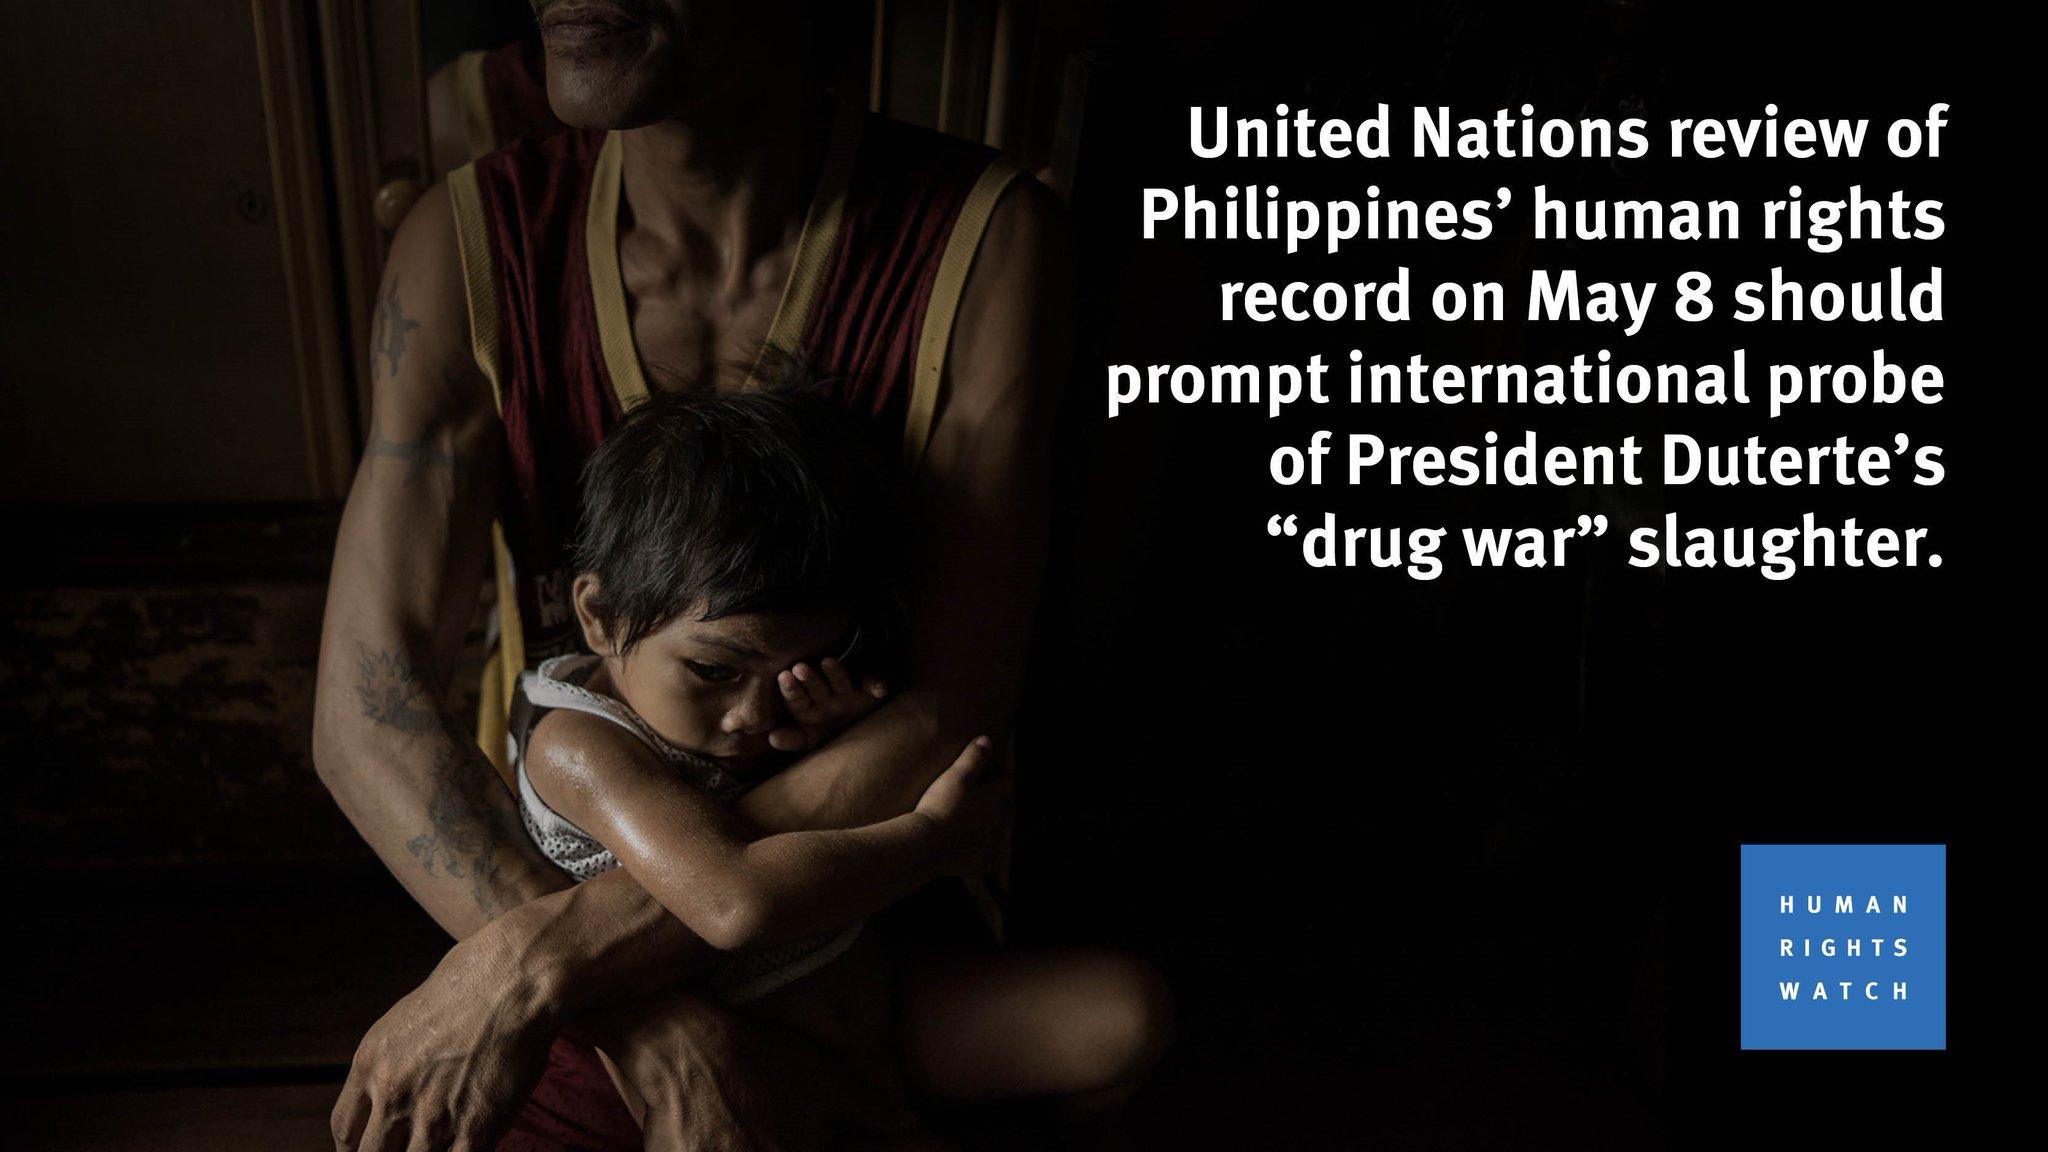 #Philippines Prez #Duterte 's deadly drug war merits urgent @UN -led independent probe via @hrw  https://t.co/GutsVmuDev #UPRPhilippines https://t.co/AKhQ8j83Vf